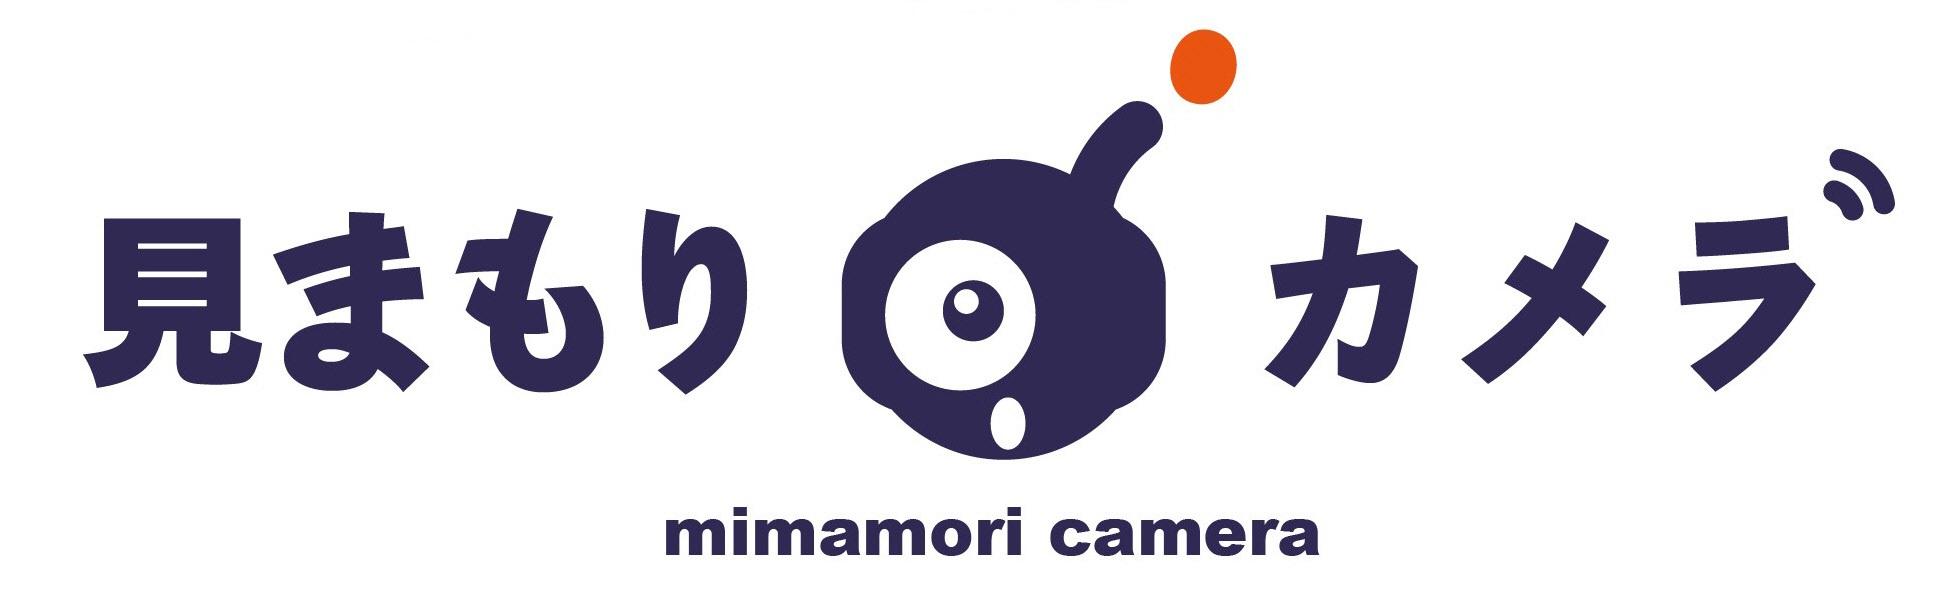 MIMAMORI_NEW